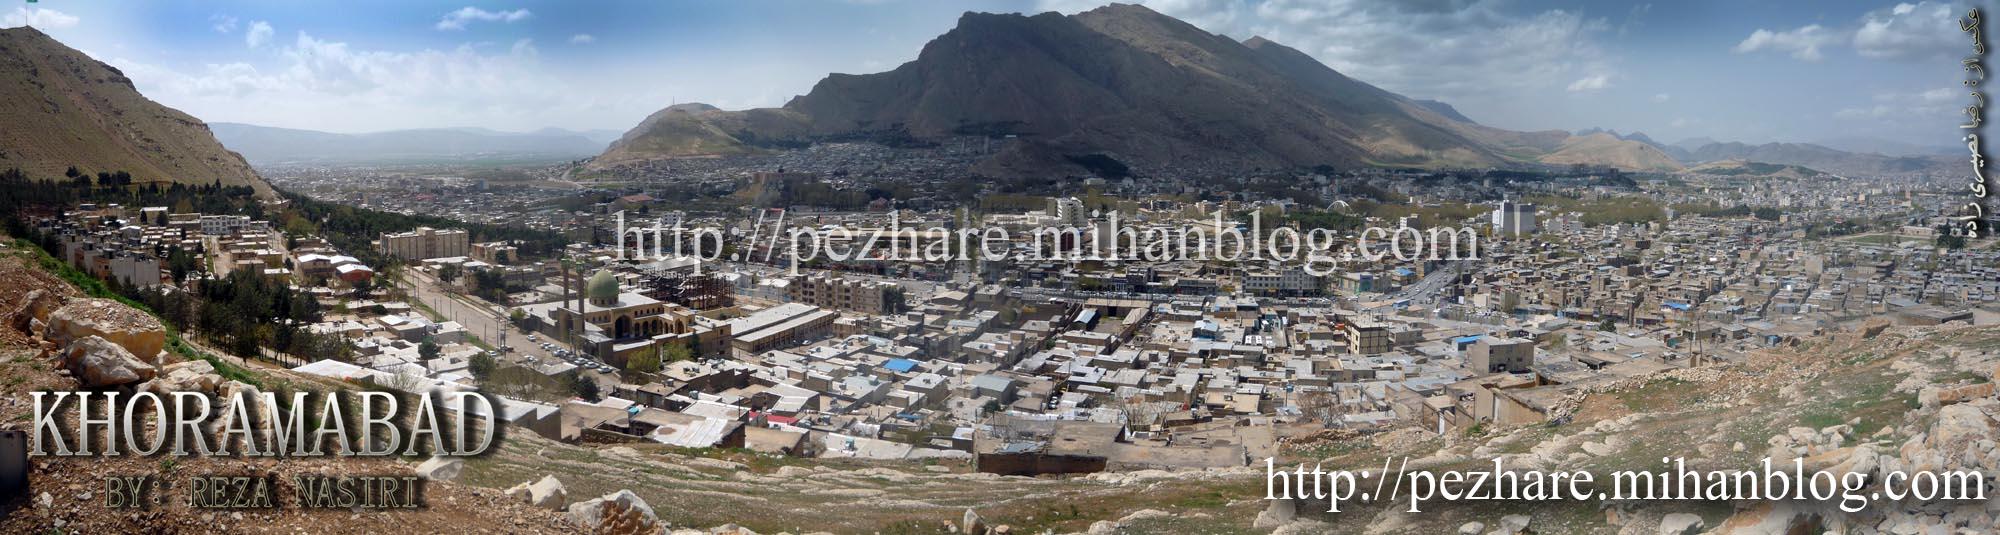 شهر خرم آباد